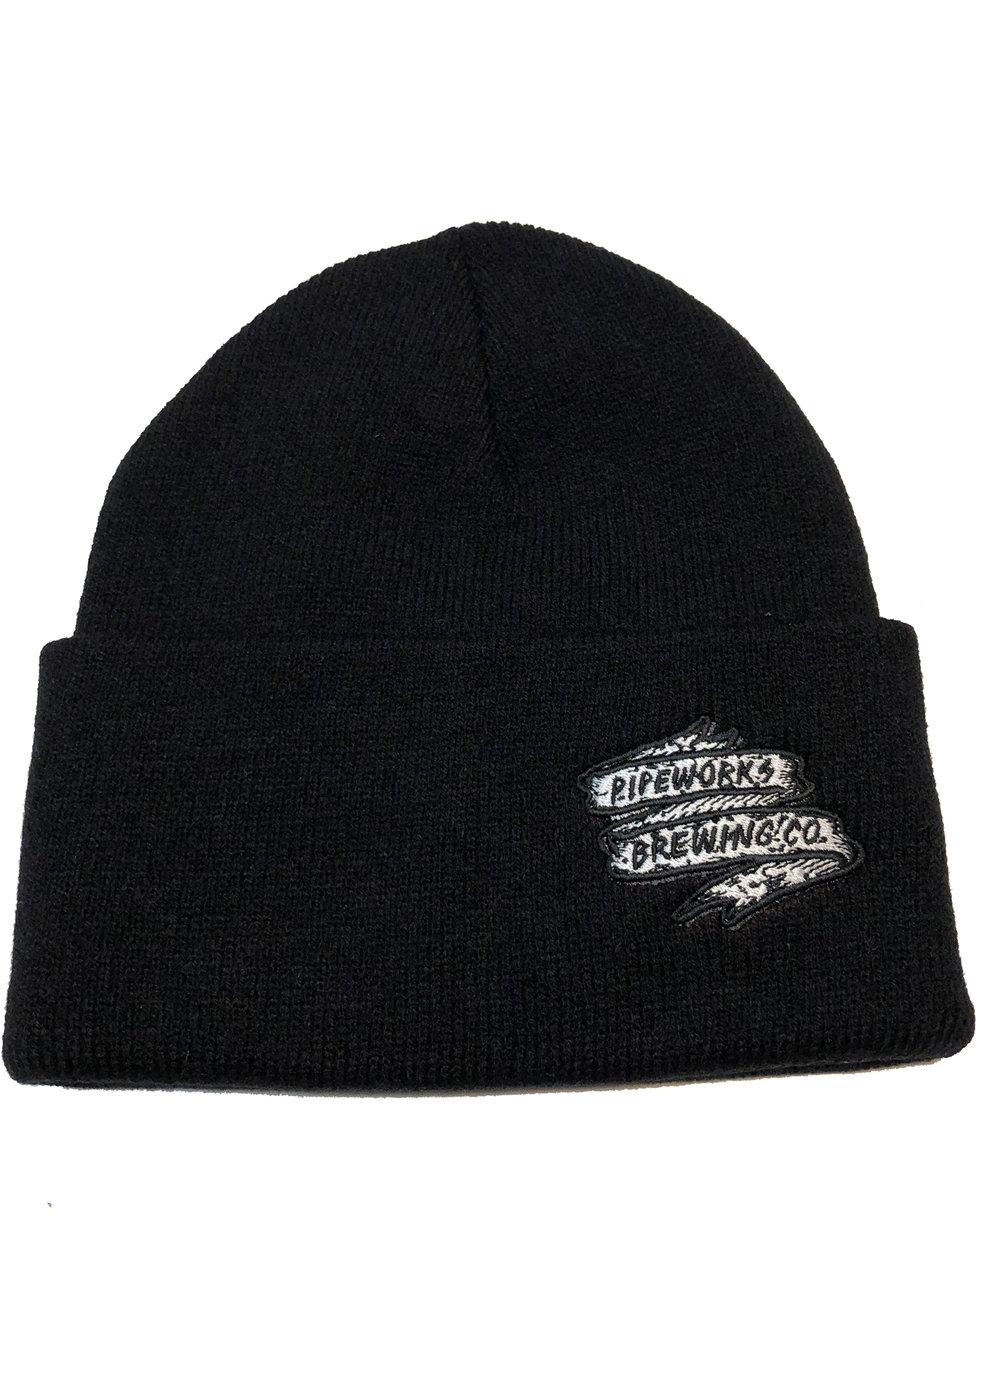 black_hat.jpg